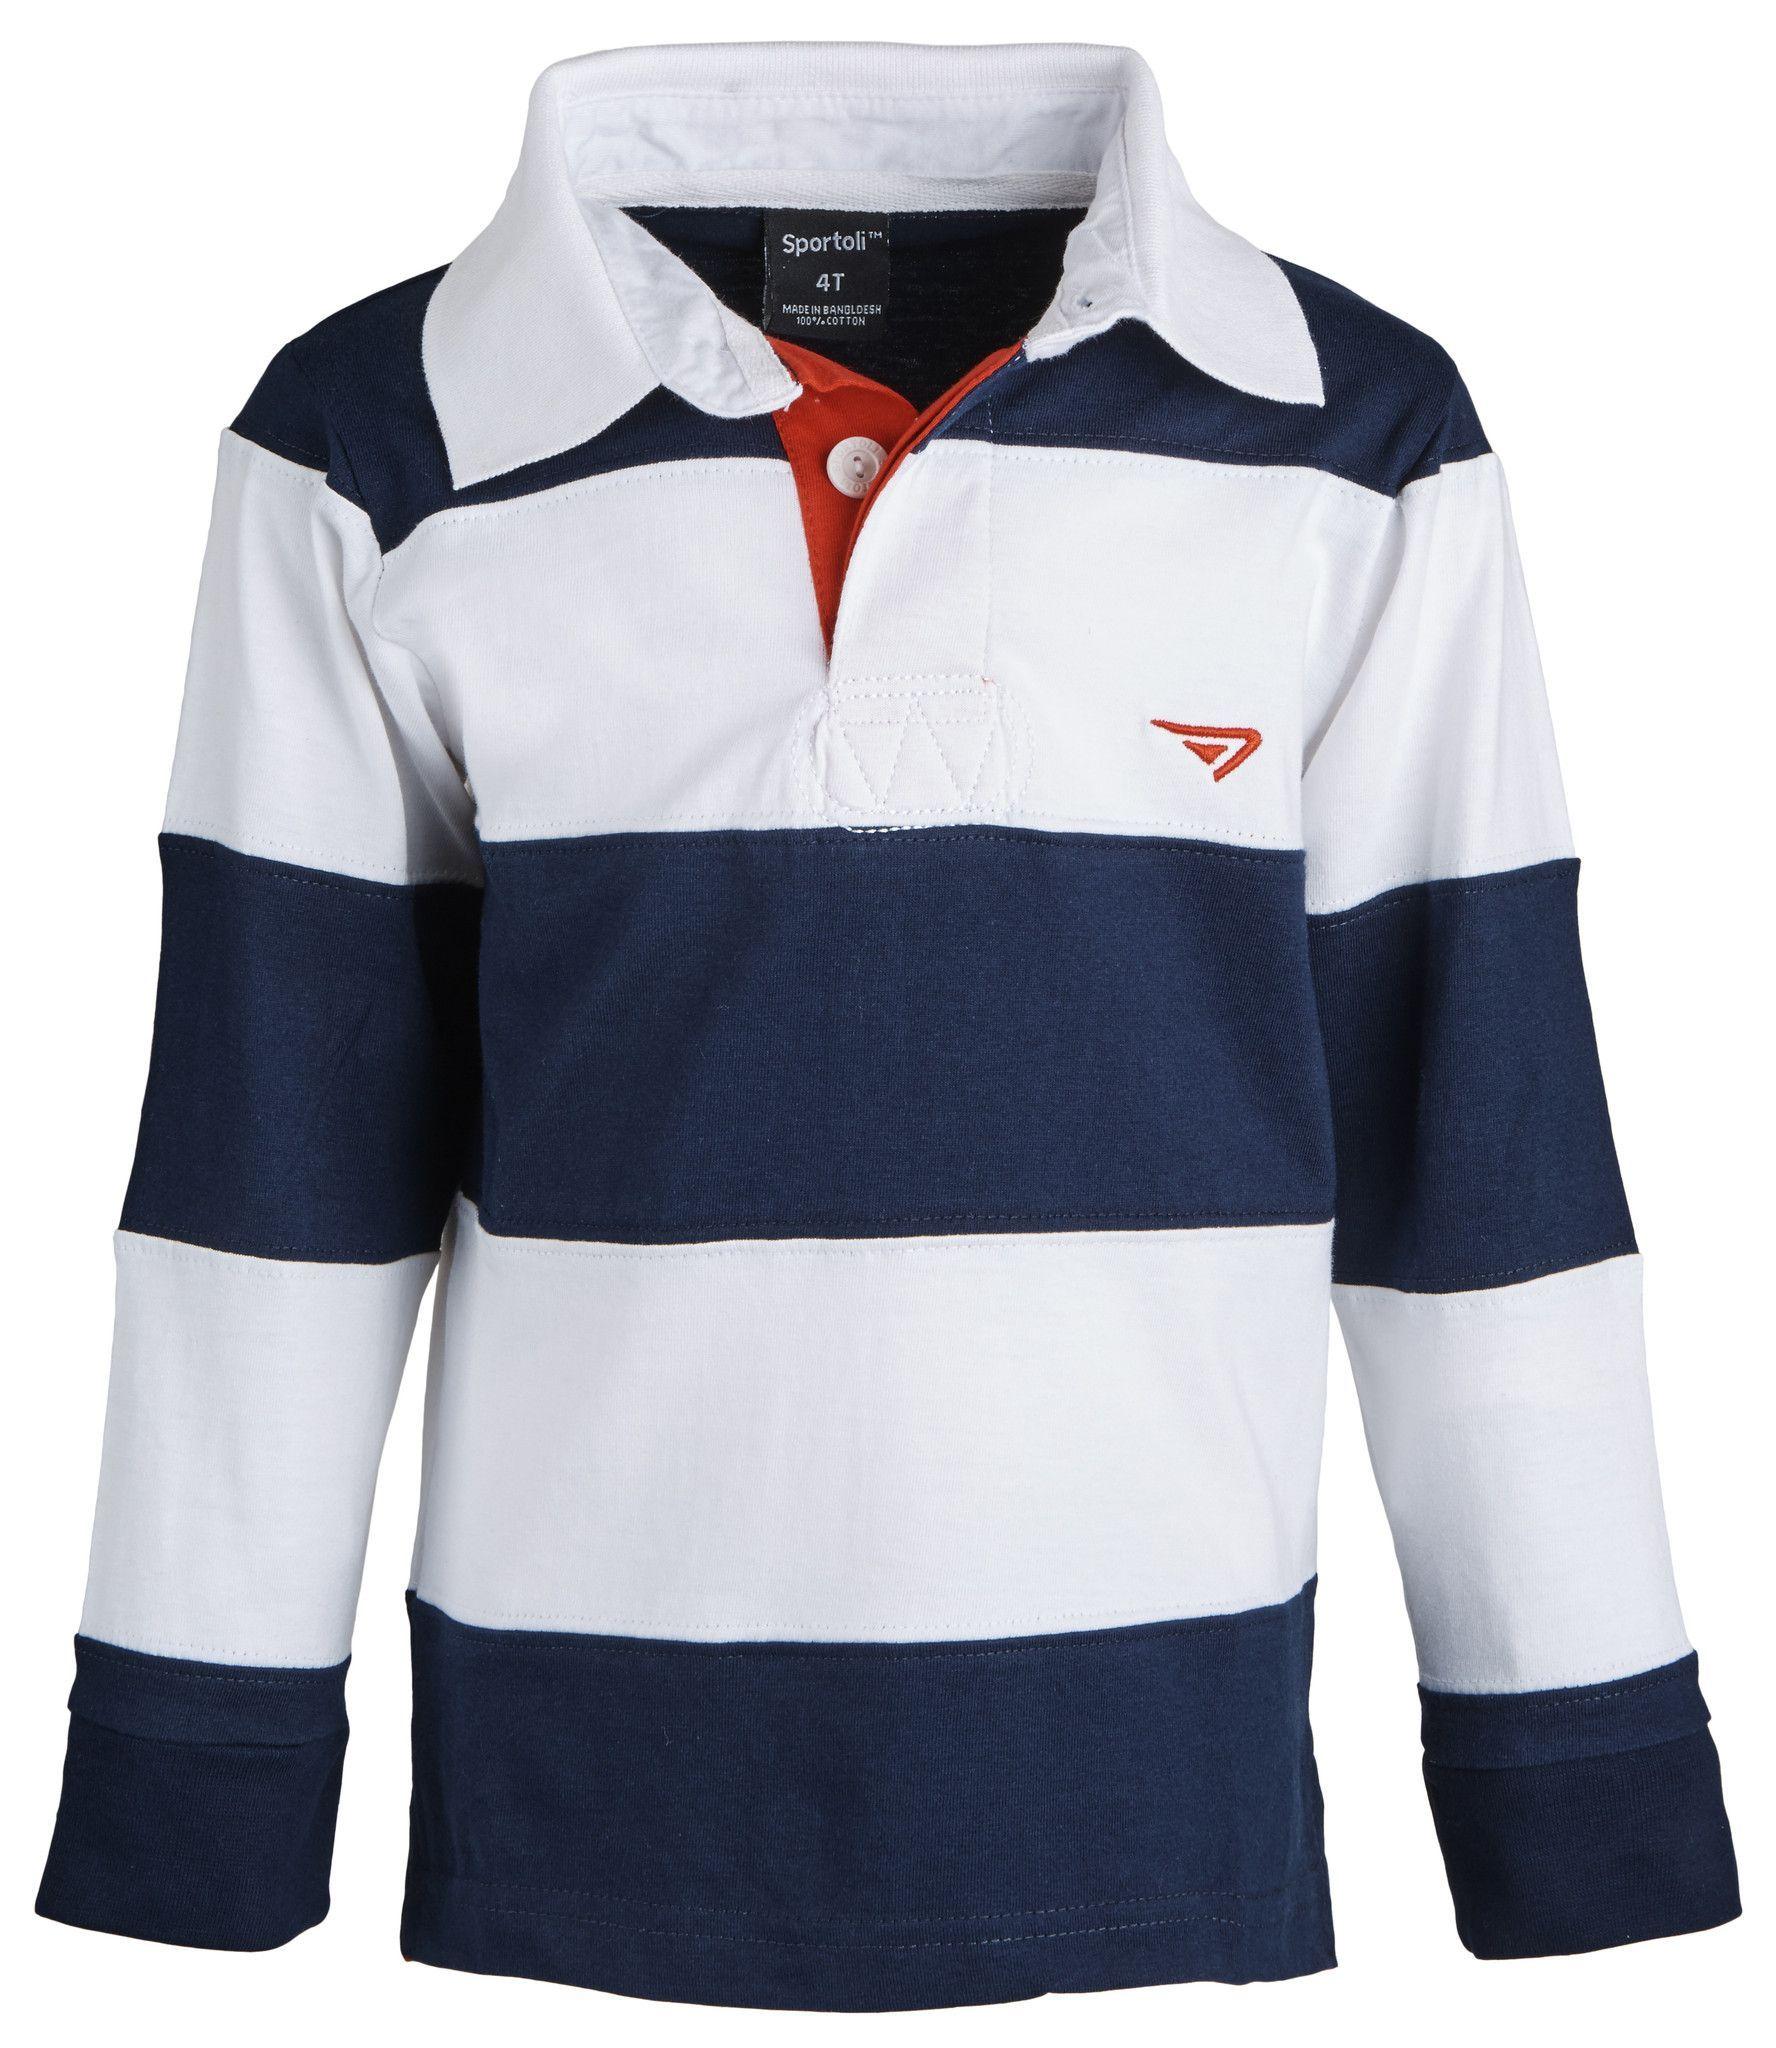 b0dca44fa048ea Boys 100% Cotton Wide Striped Long Sleeve Polo Rugby Shirt